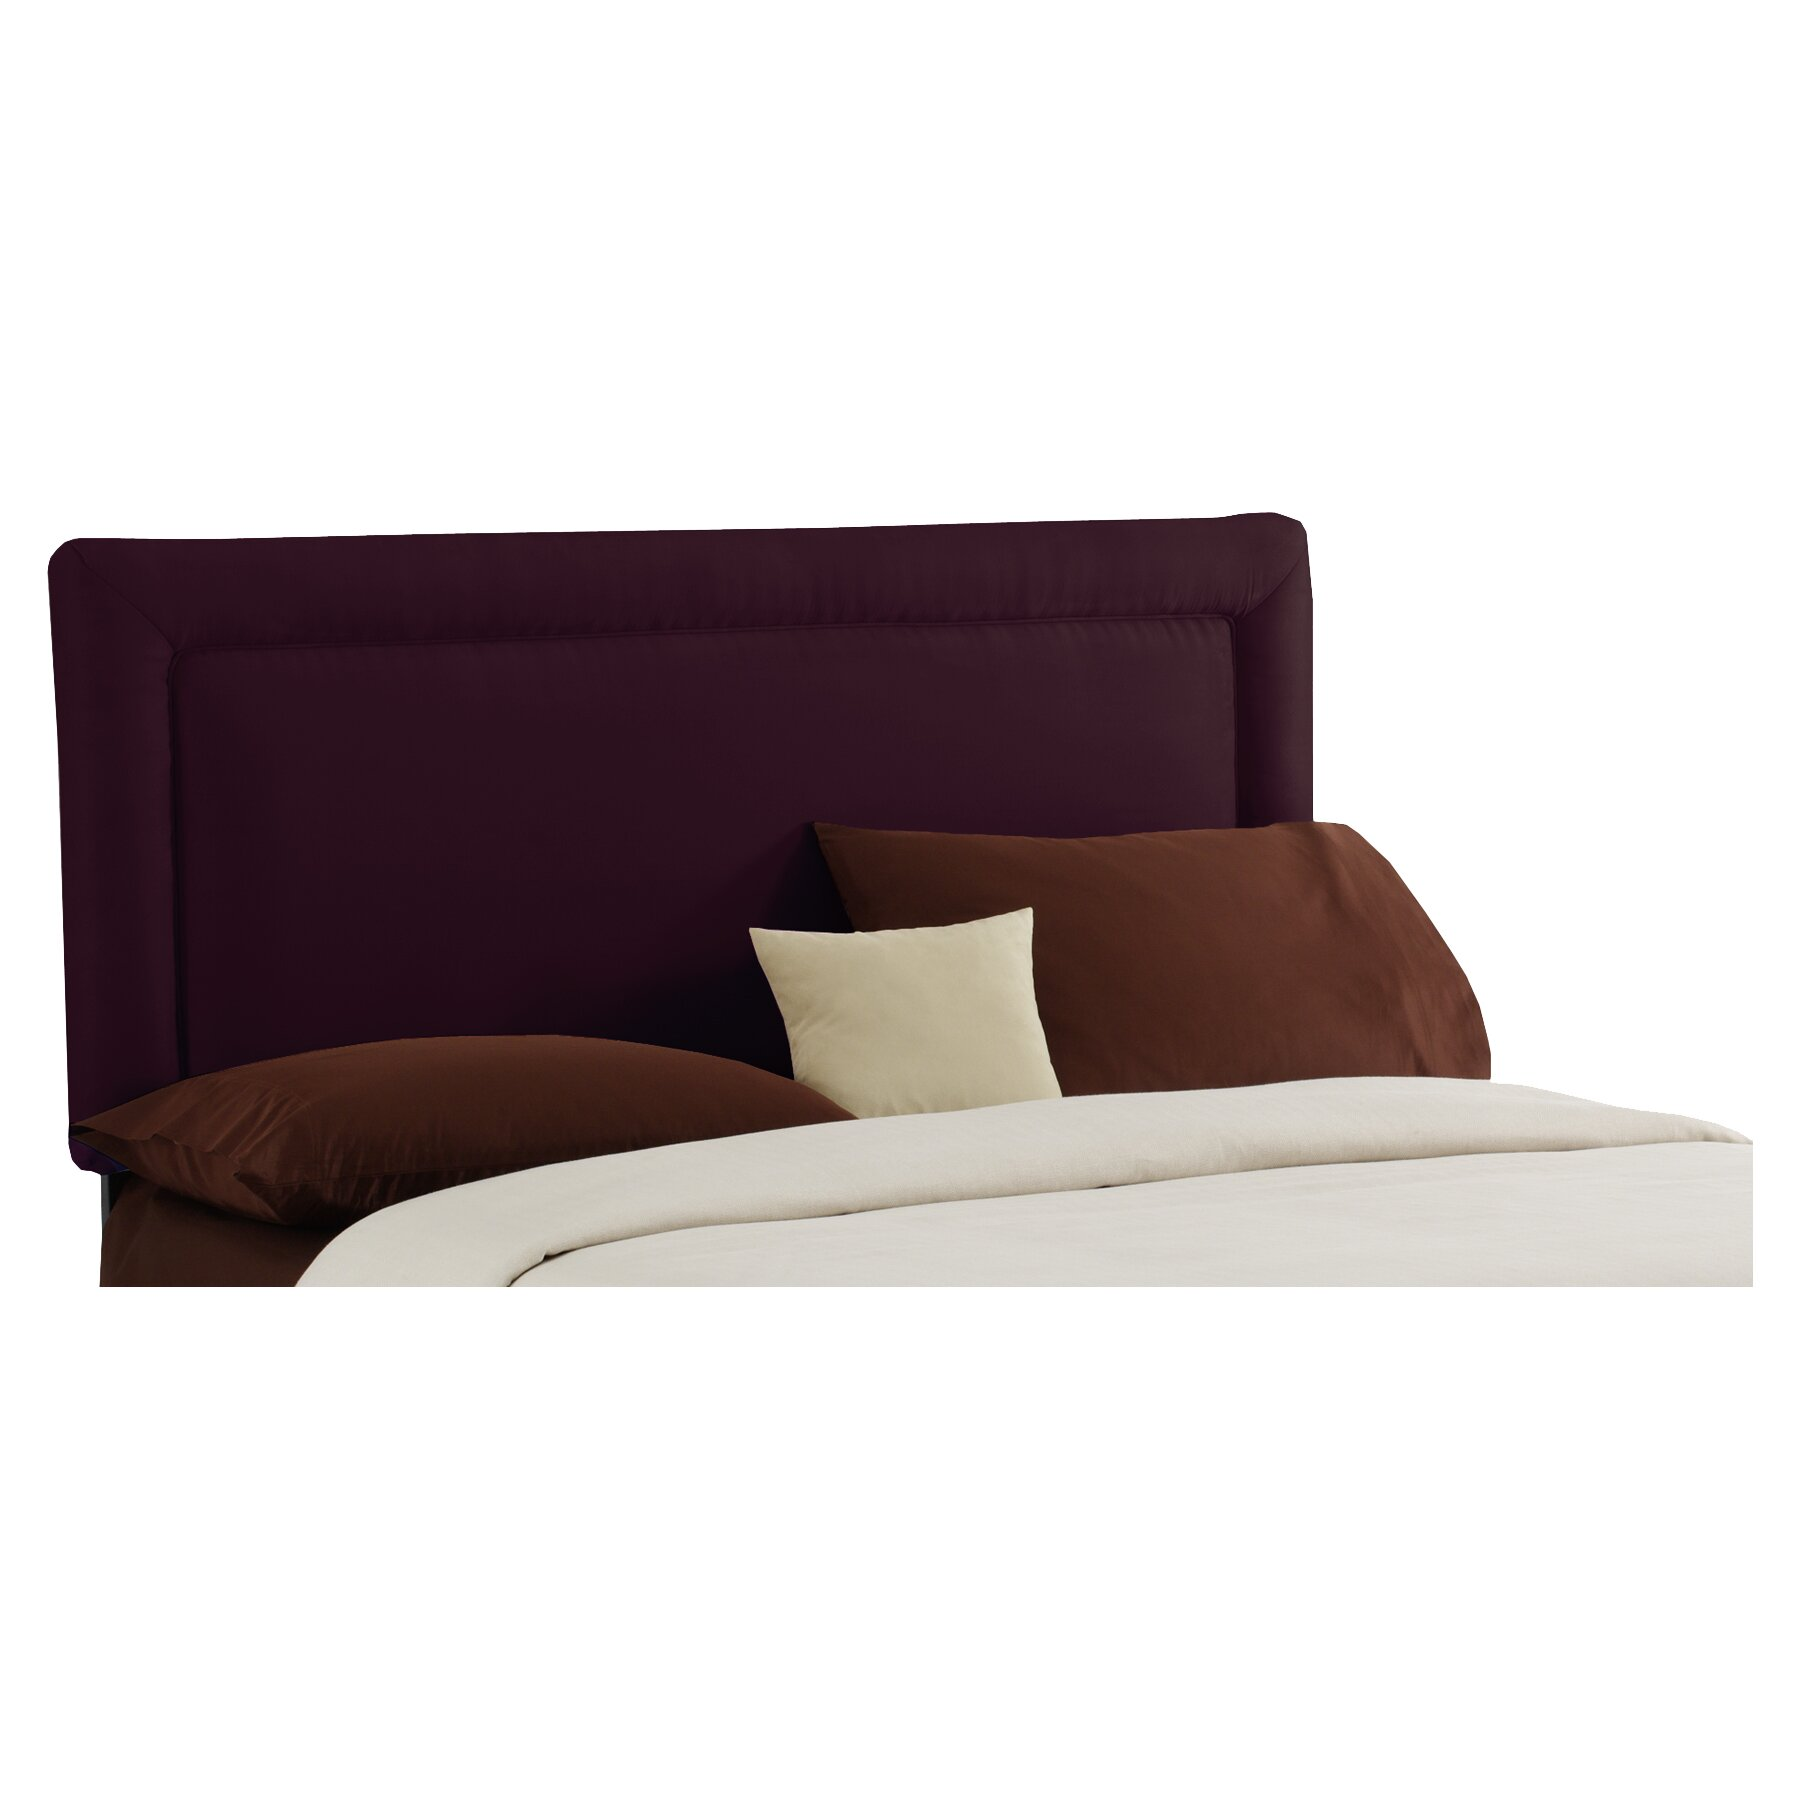 Skyline Furniture Border Upholstered Panel Headboard Reviews